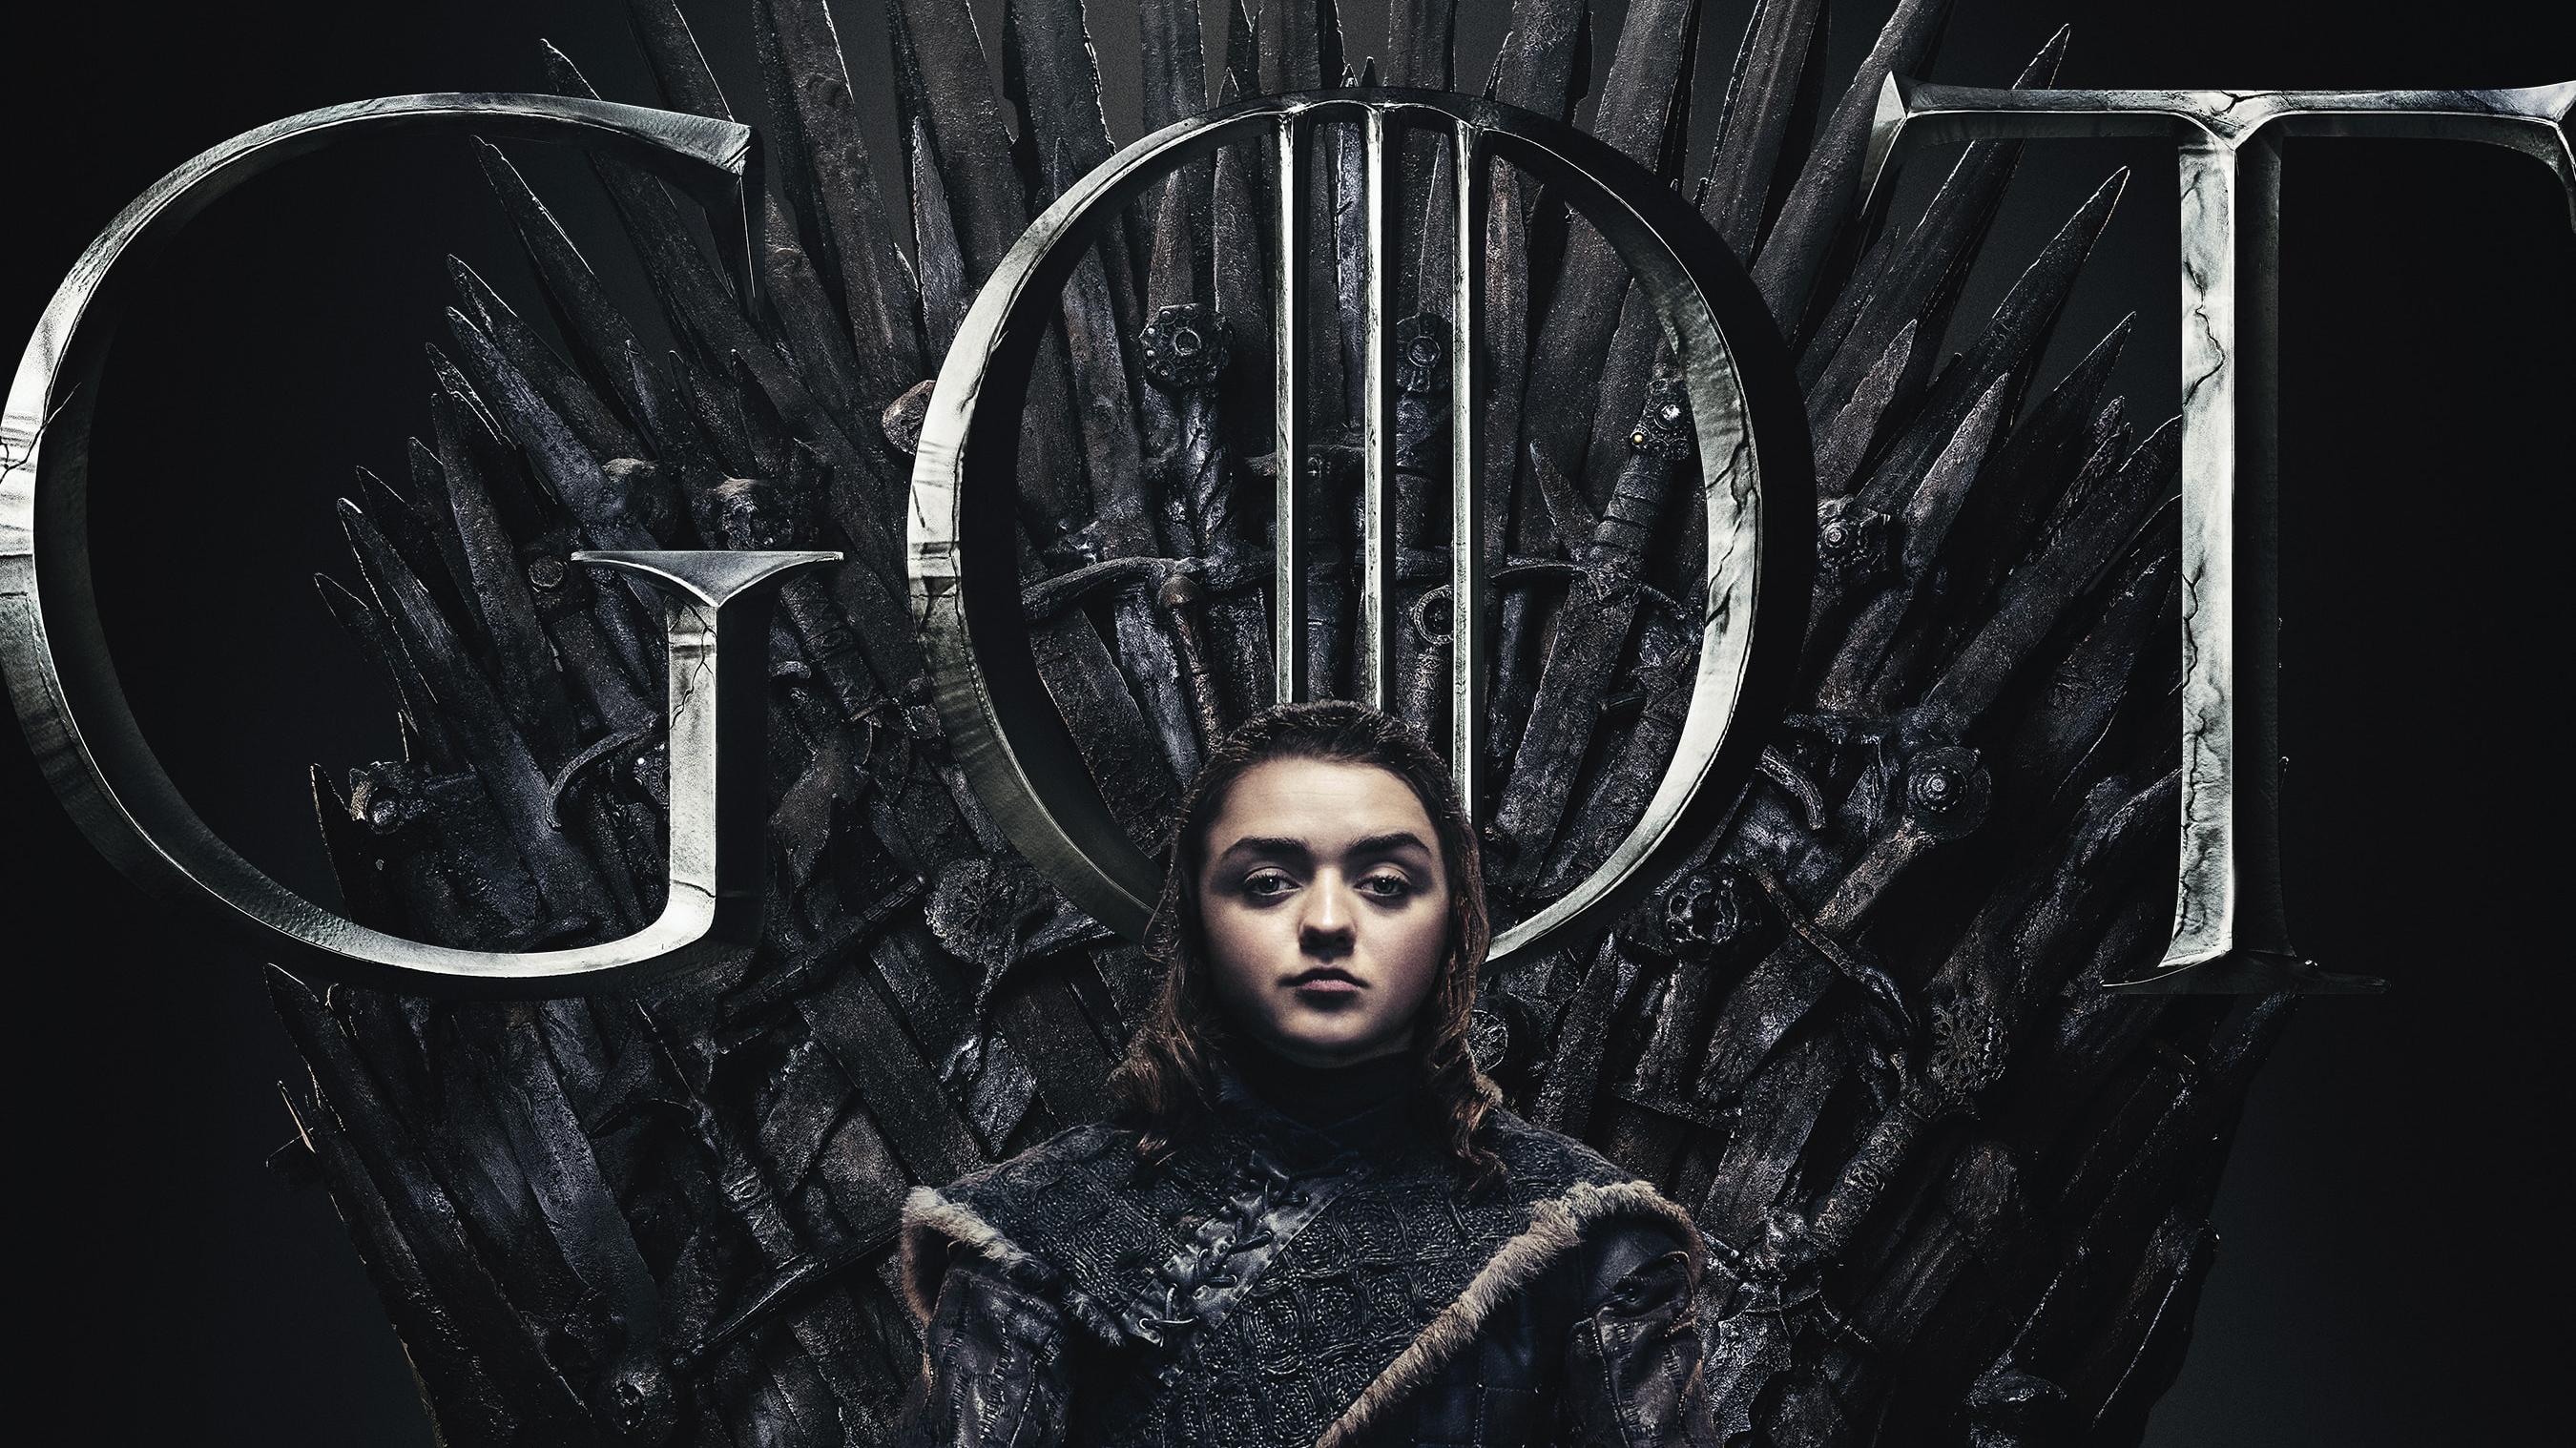 Arya Stark Game Of Thrones Season 8 Poster Hd Tv Shows 4k